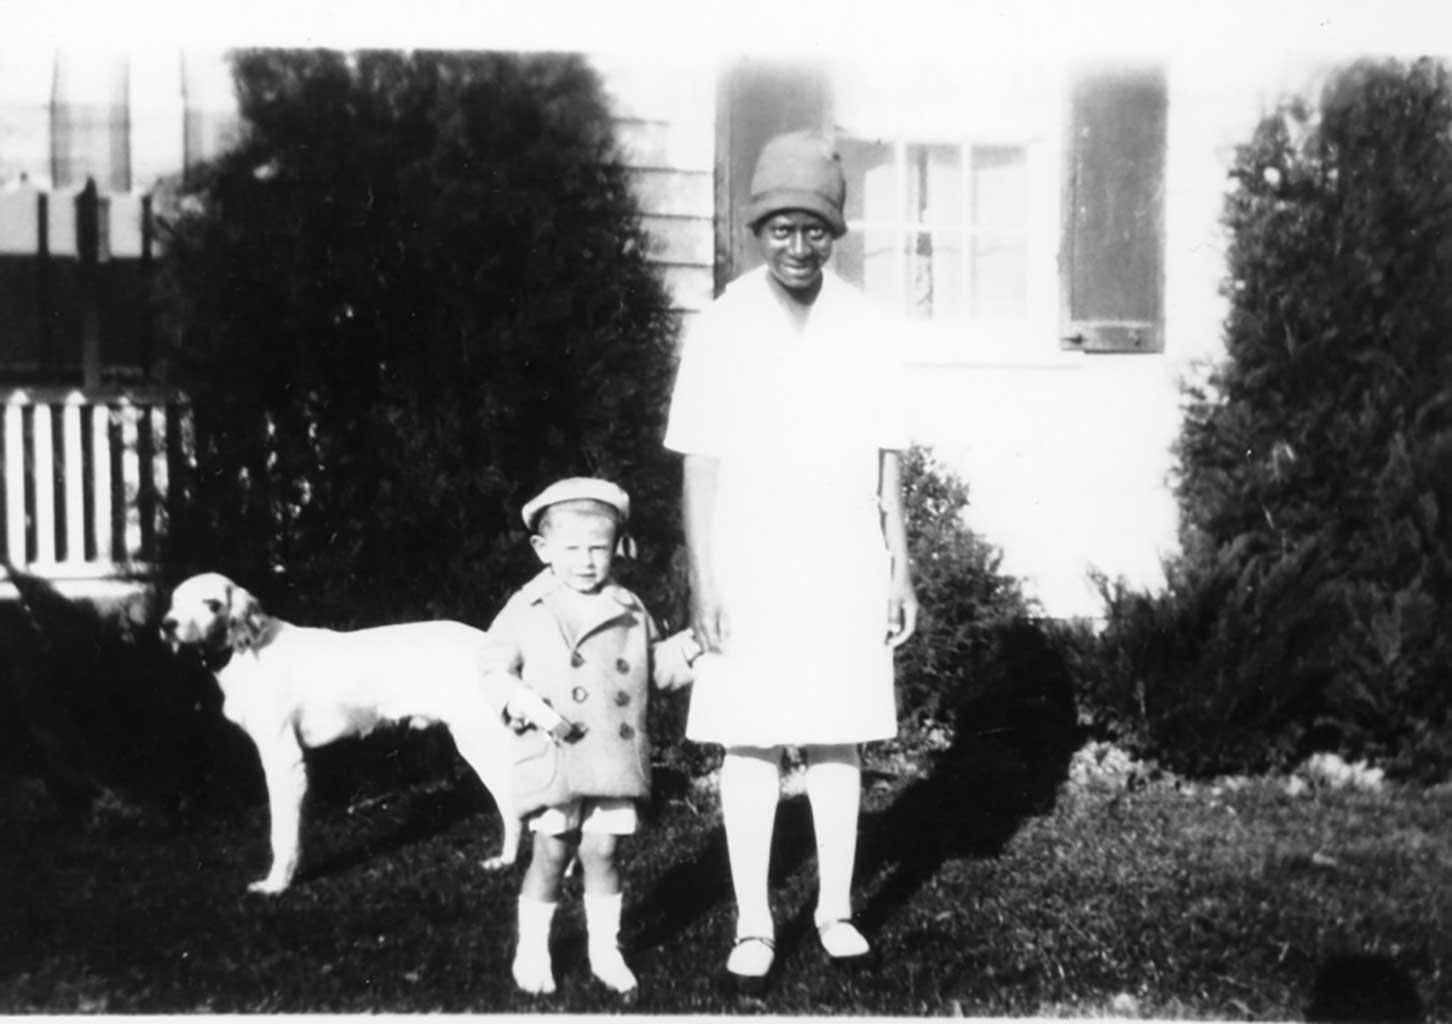 bernard-w-godwin-jr-and-mag-jones-maid-img331